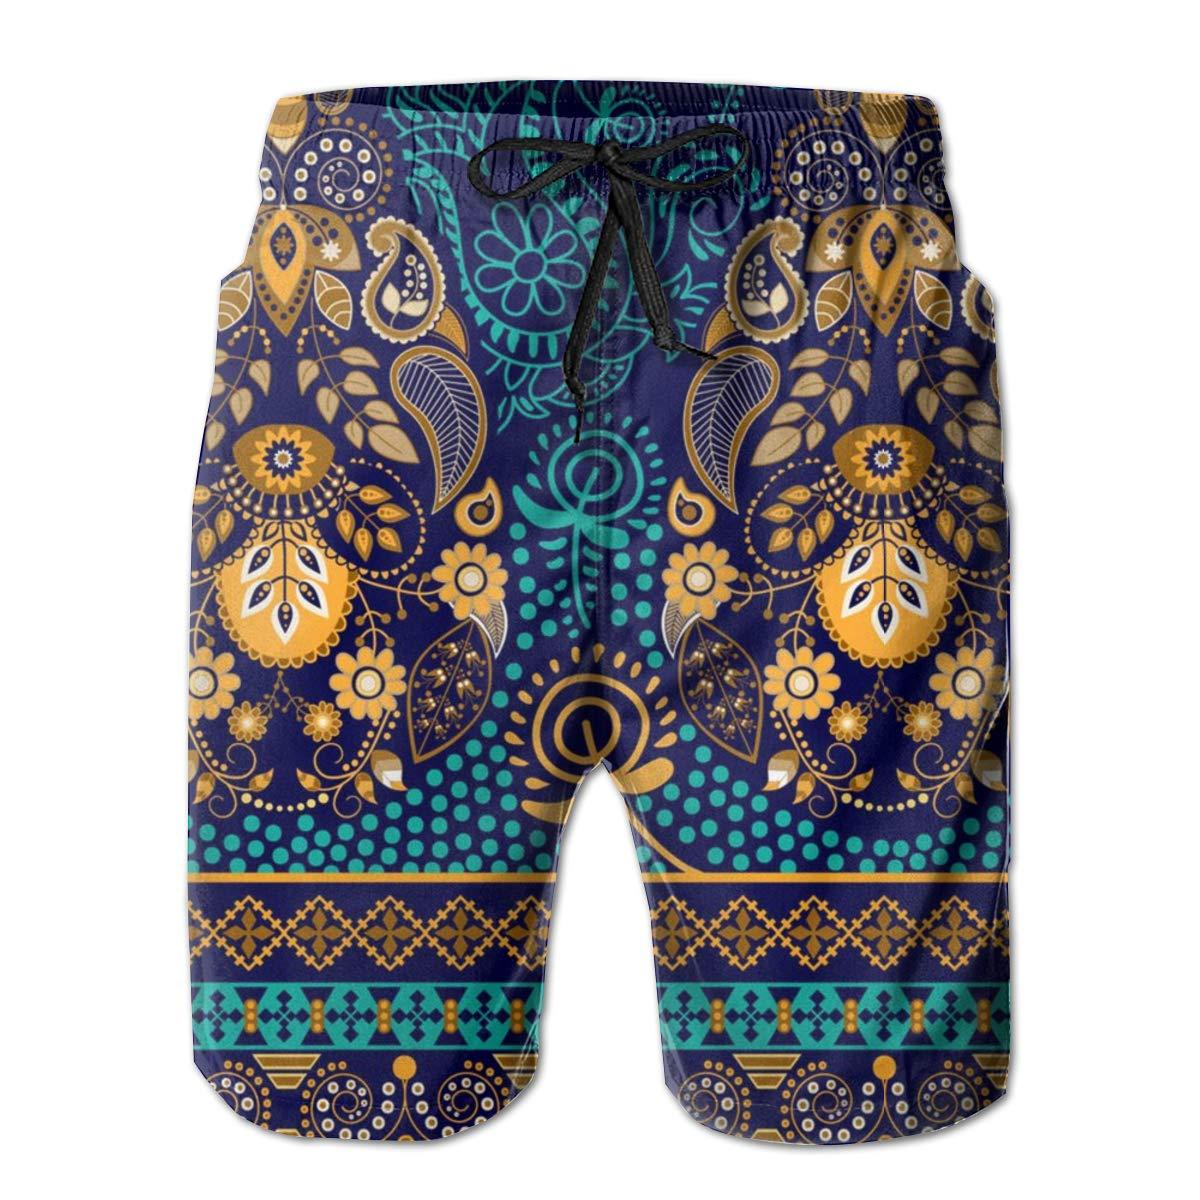 YOUSHO Mens Swim Trunks Paisley Wallpaper Beach Shorts Quick Dry Mesh Lining Board Shorts Swimwear with Pockets